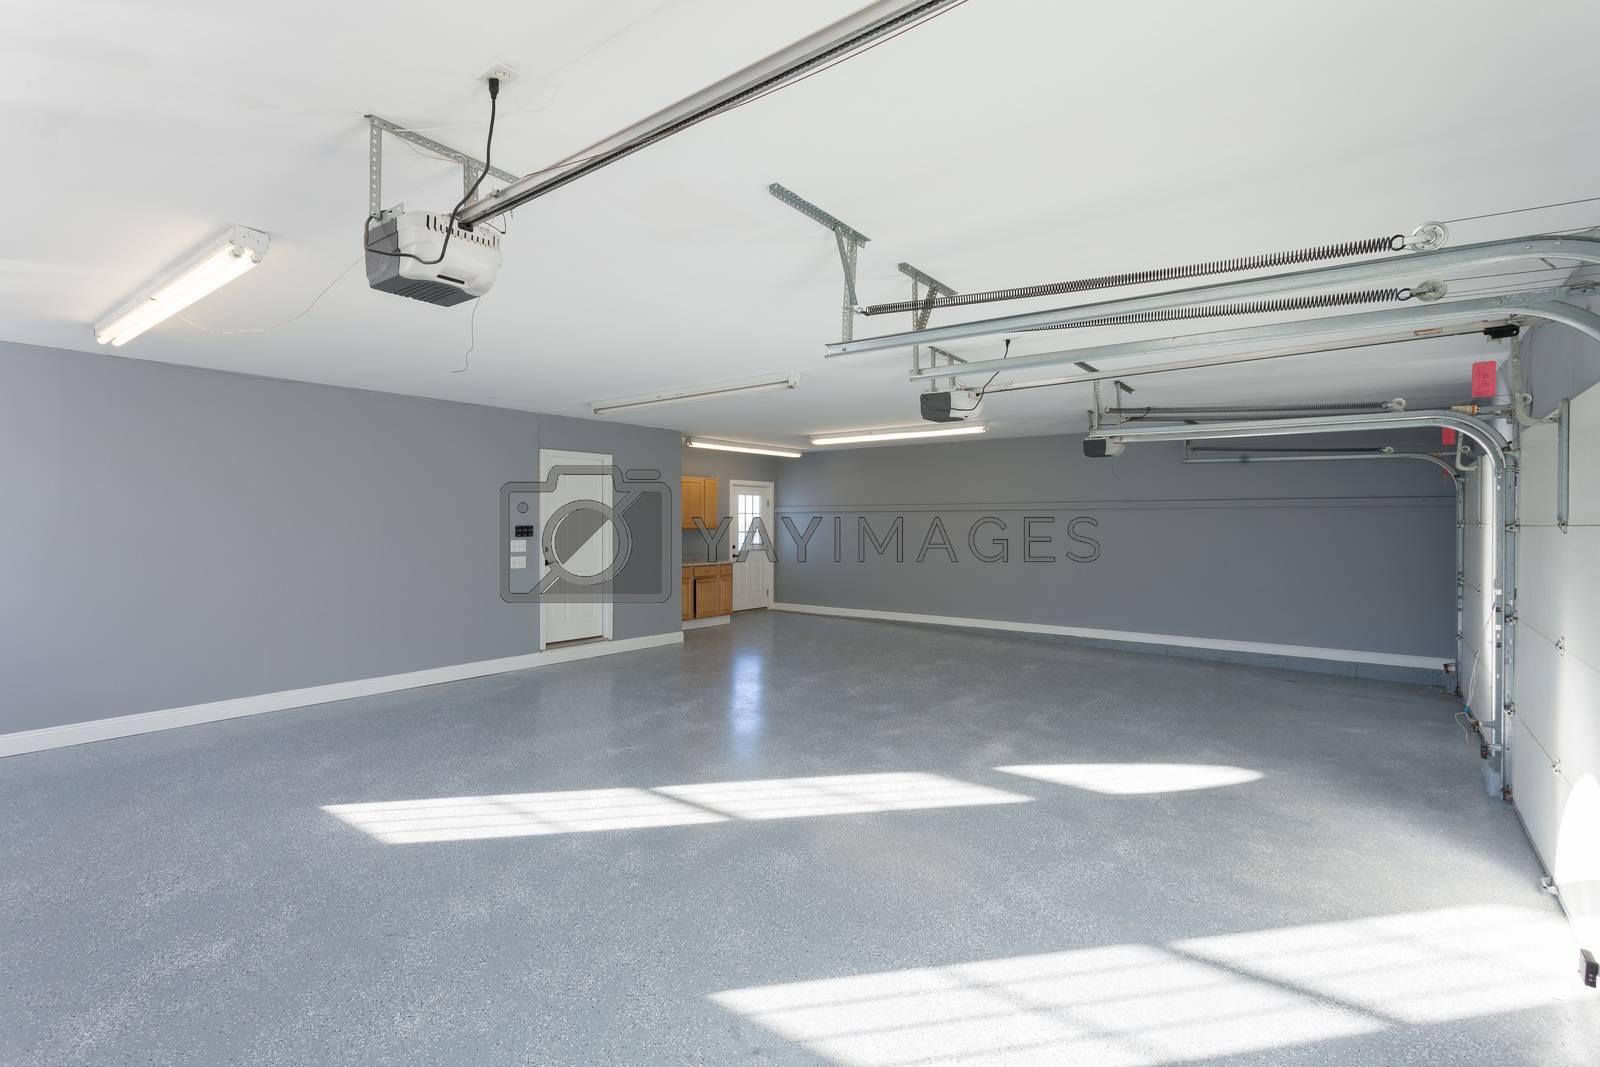 Home Garage Interior by graficallyminded